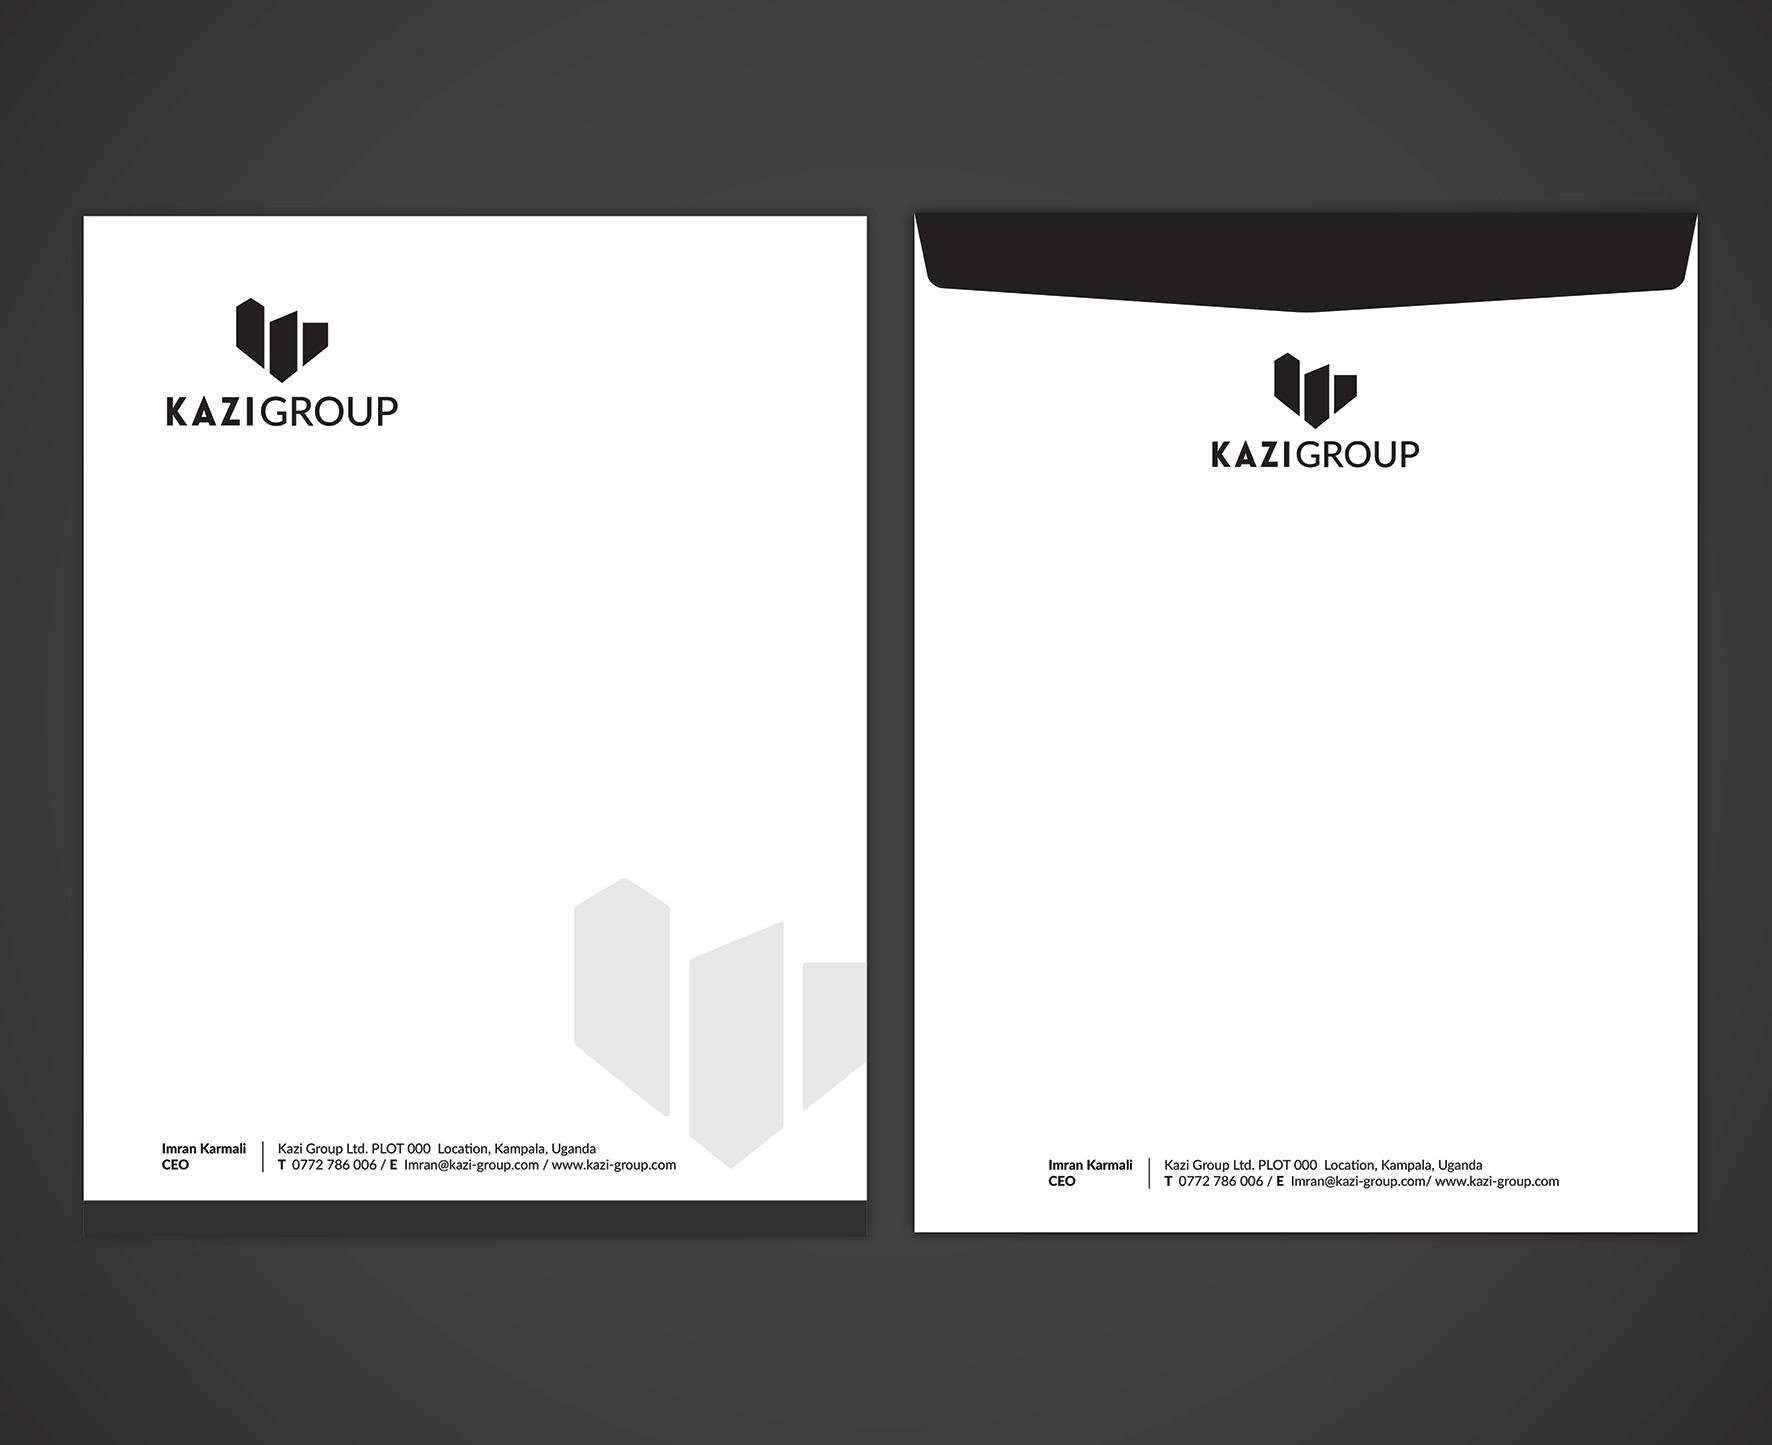 Kazi Group branded stationary